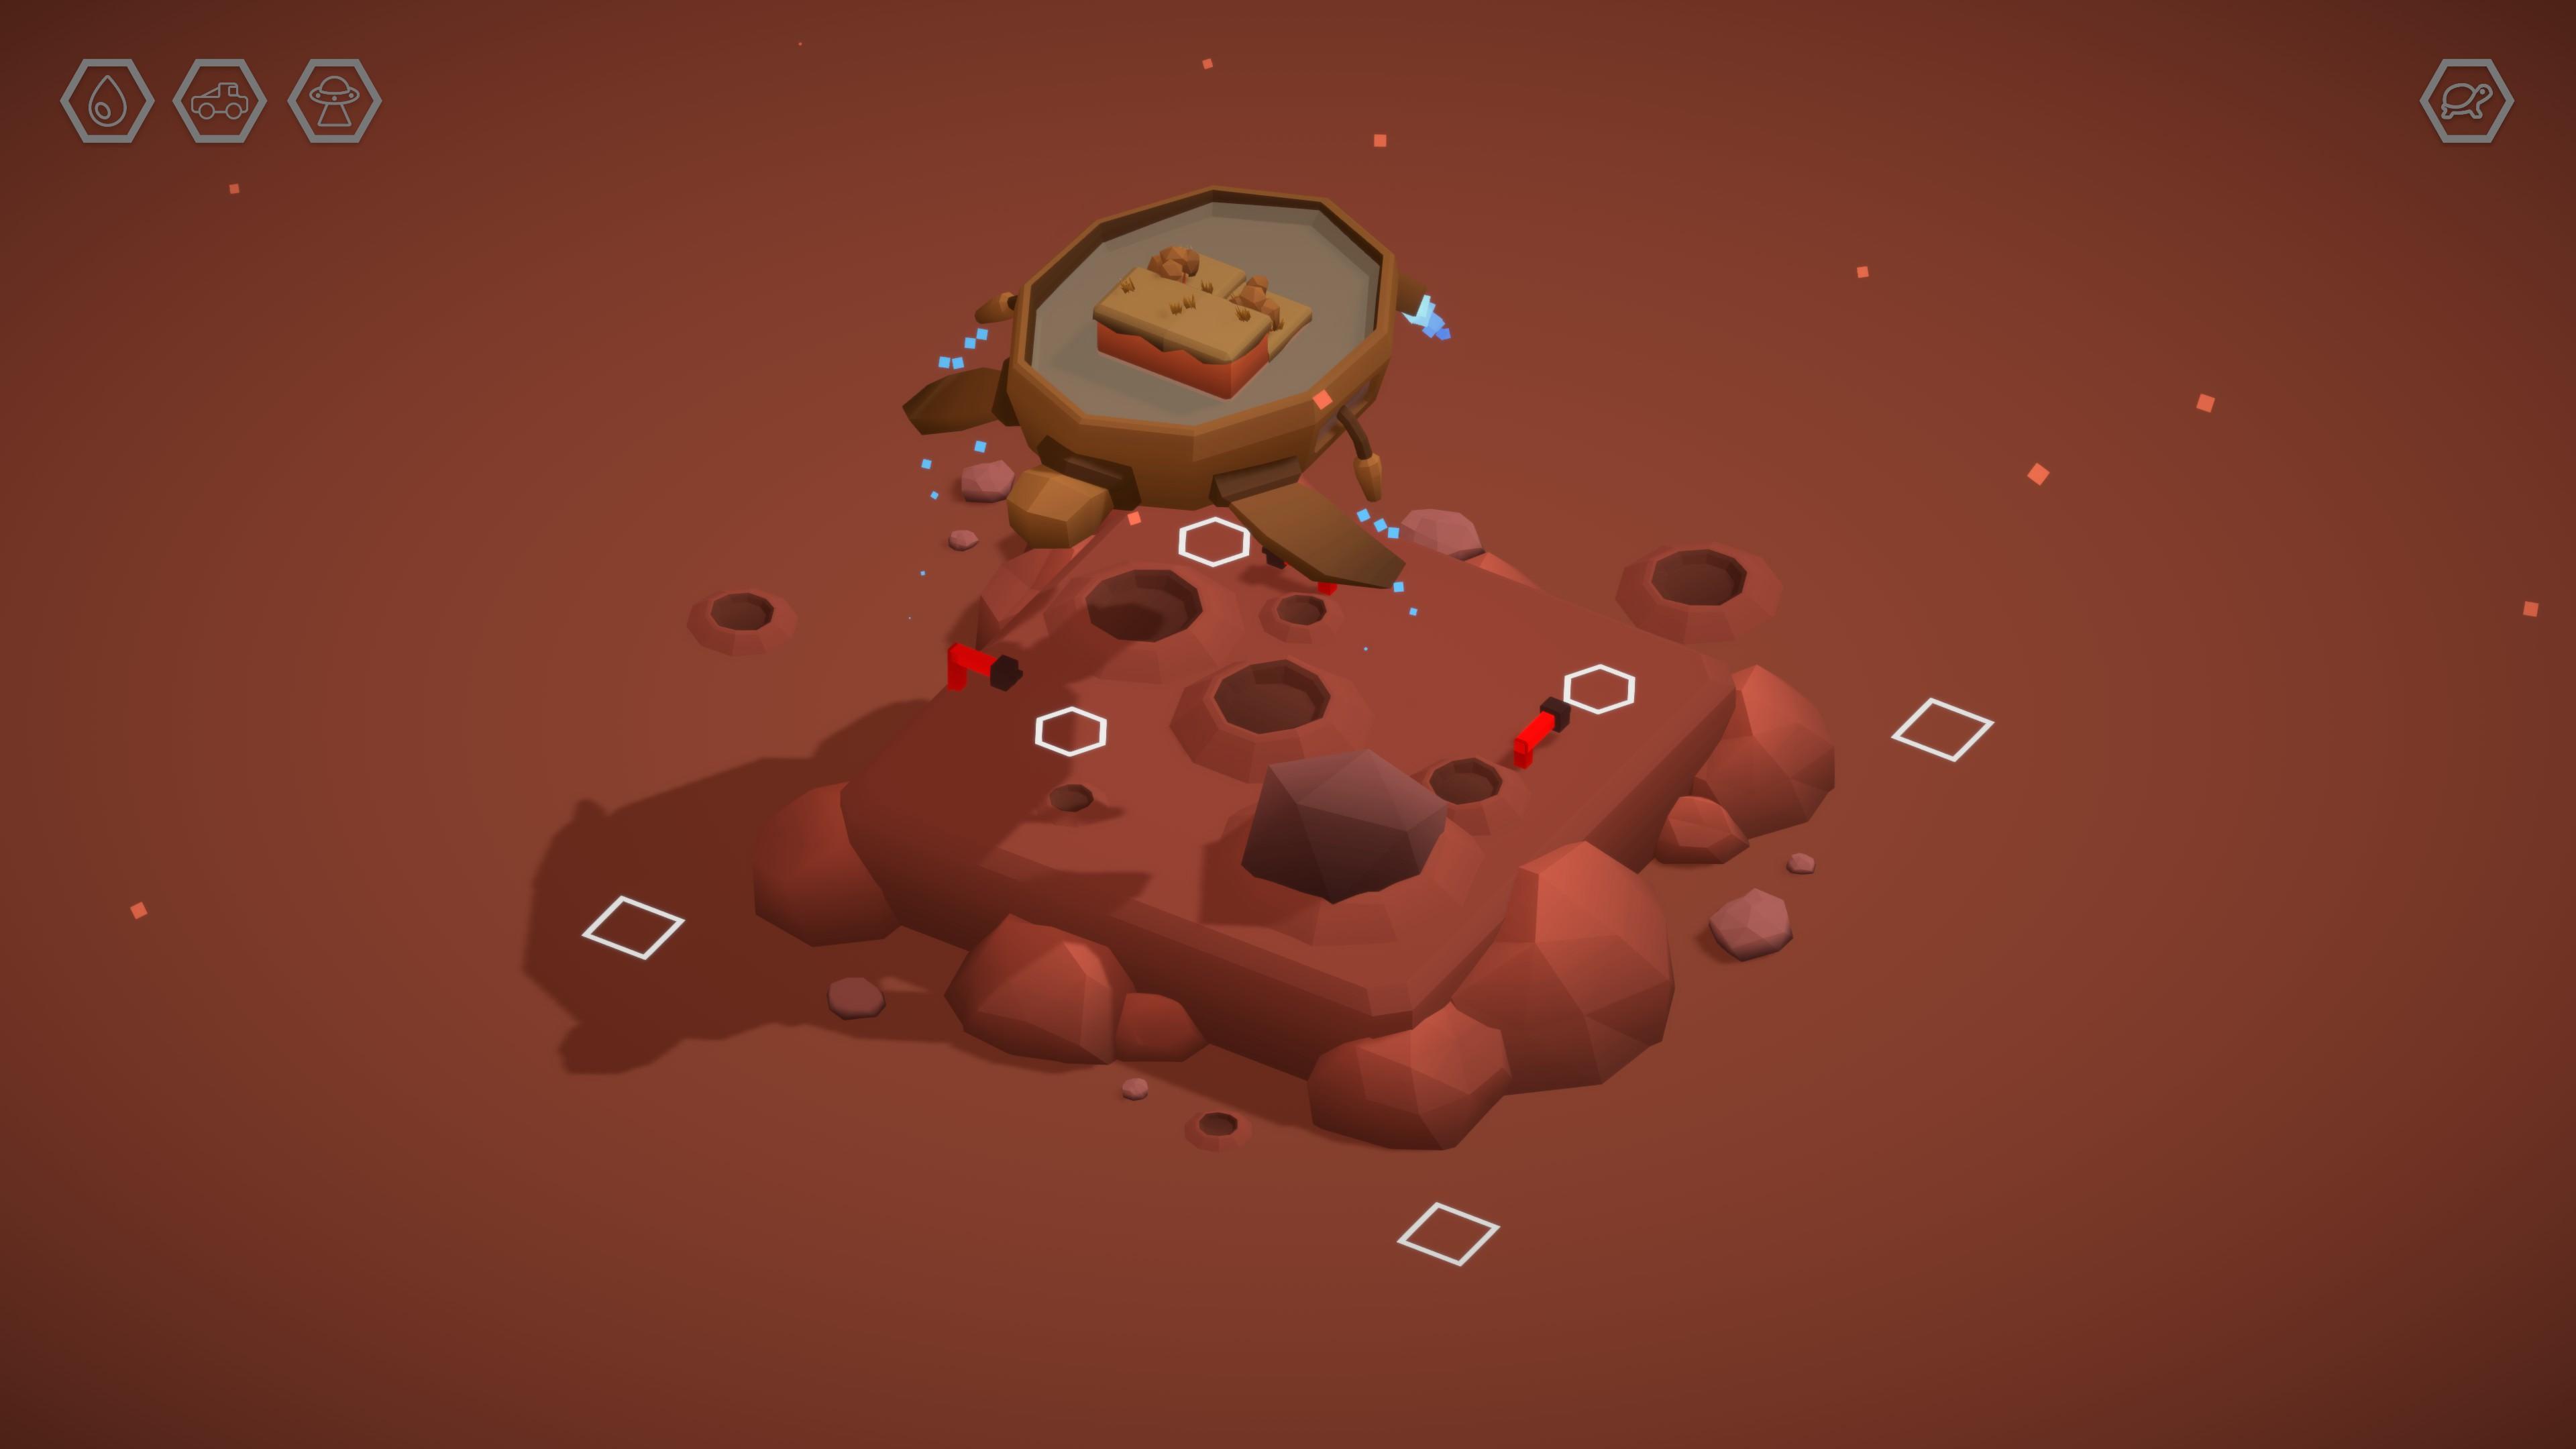 Sizeable game screenshot.